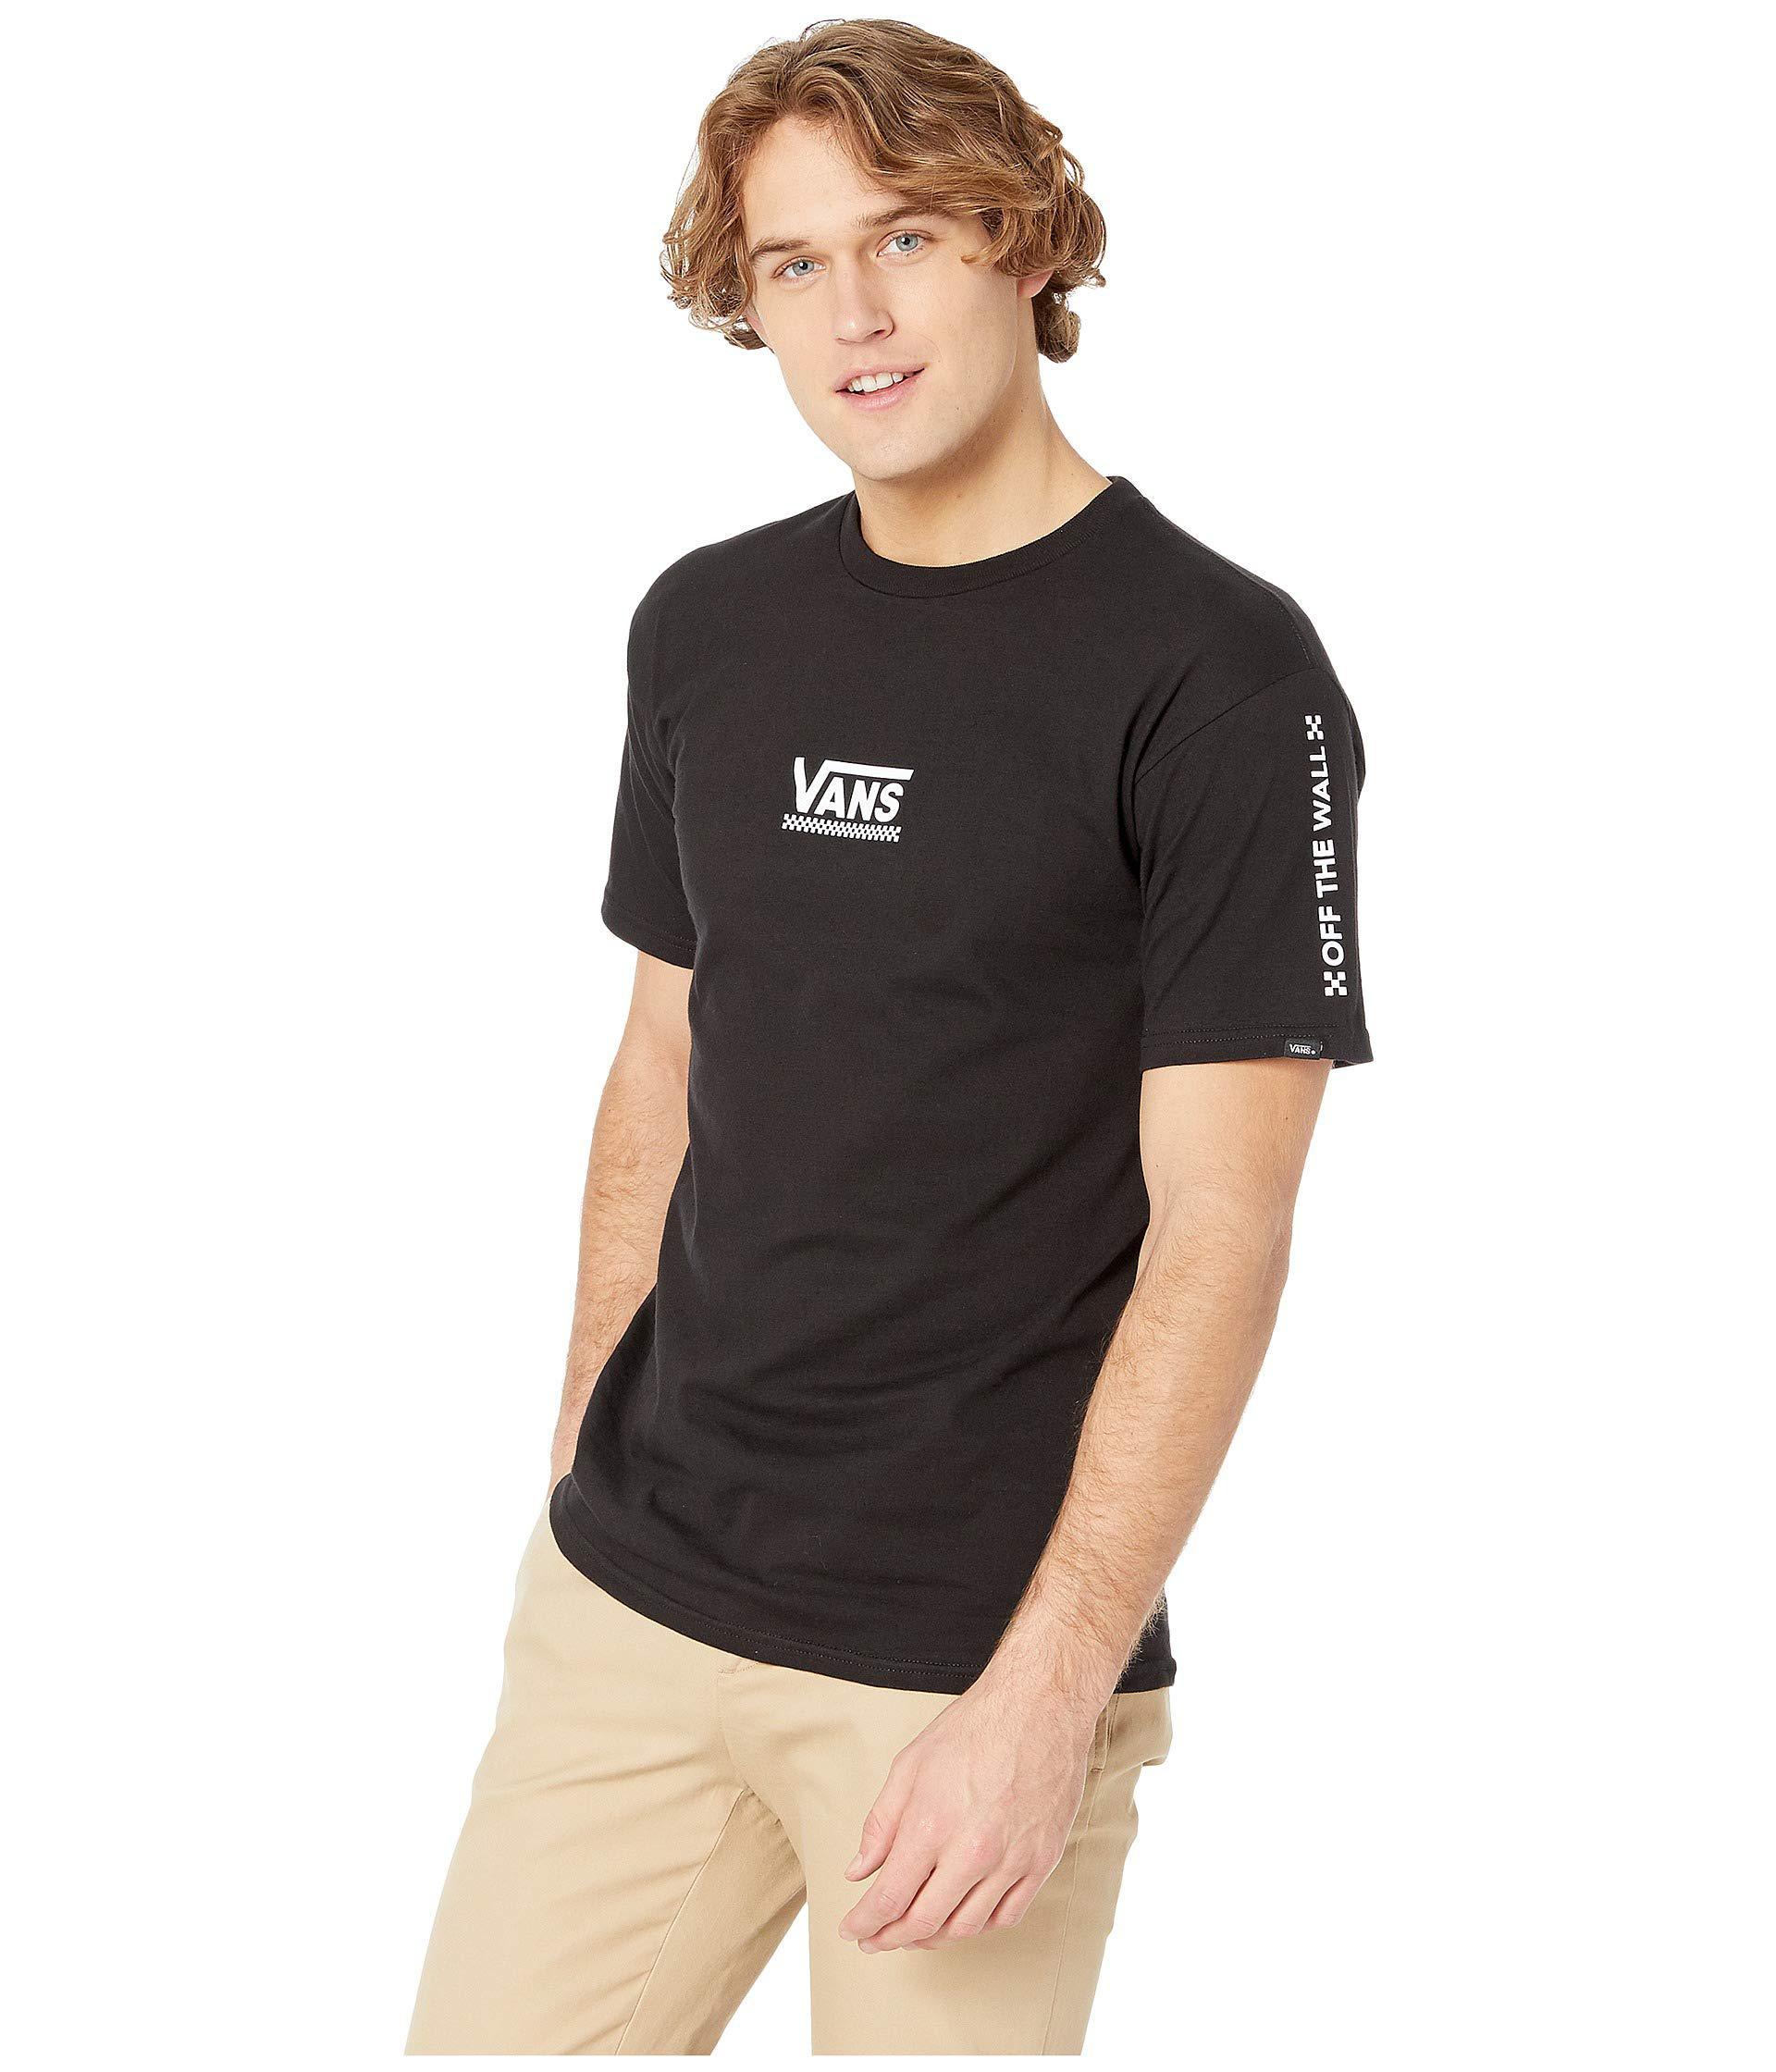 Lyst - Vans Checkmate Iii Short Sleeve T-shirt (royal) Men s Clothing in  Black for Men 0bcb69b9a